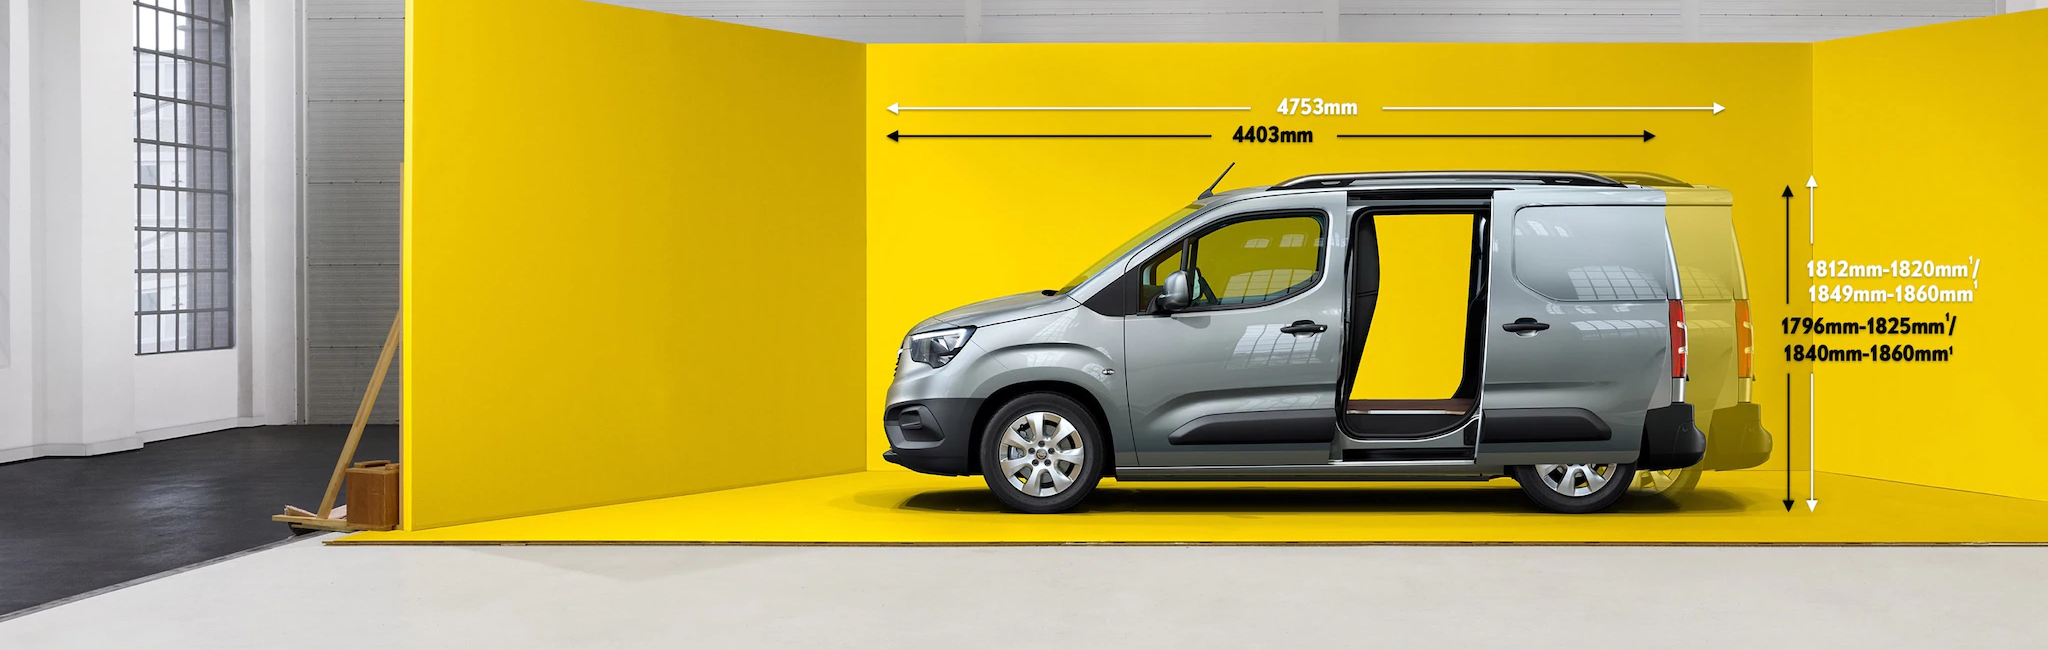 Opel_combo_cargo_measurements_21x9_cmc19_e01_053